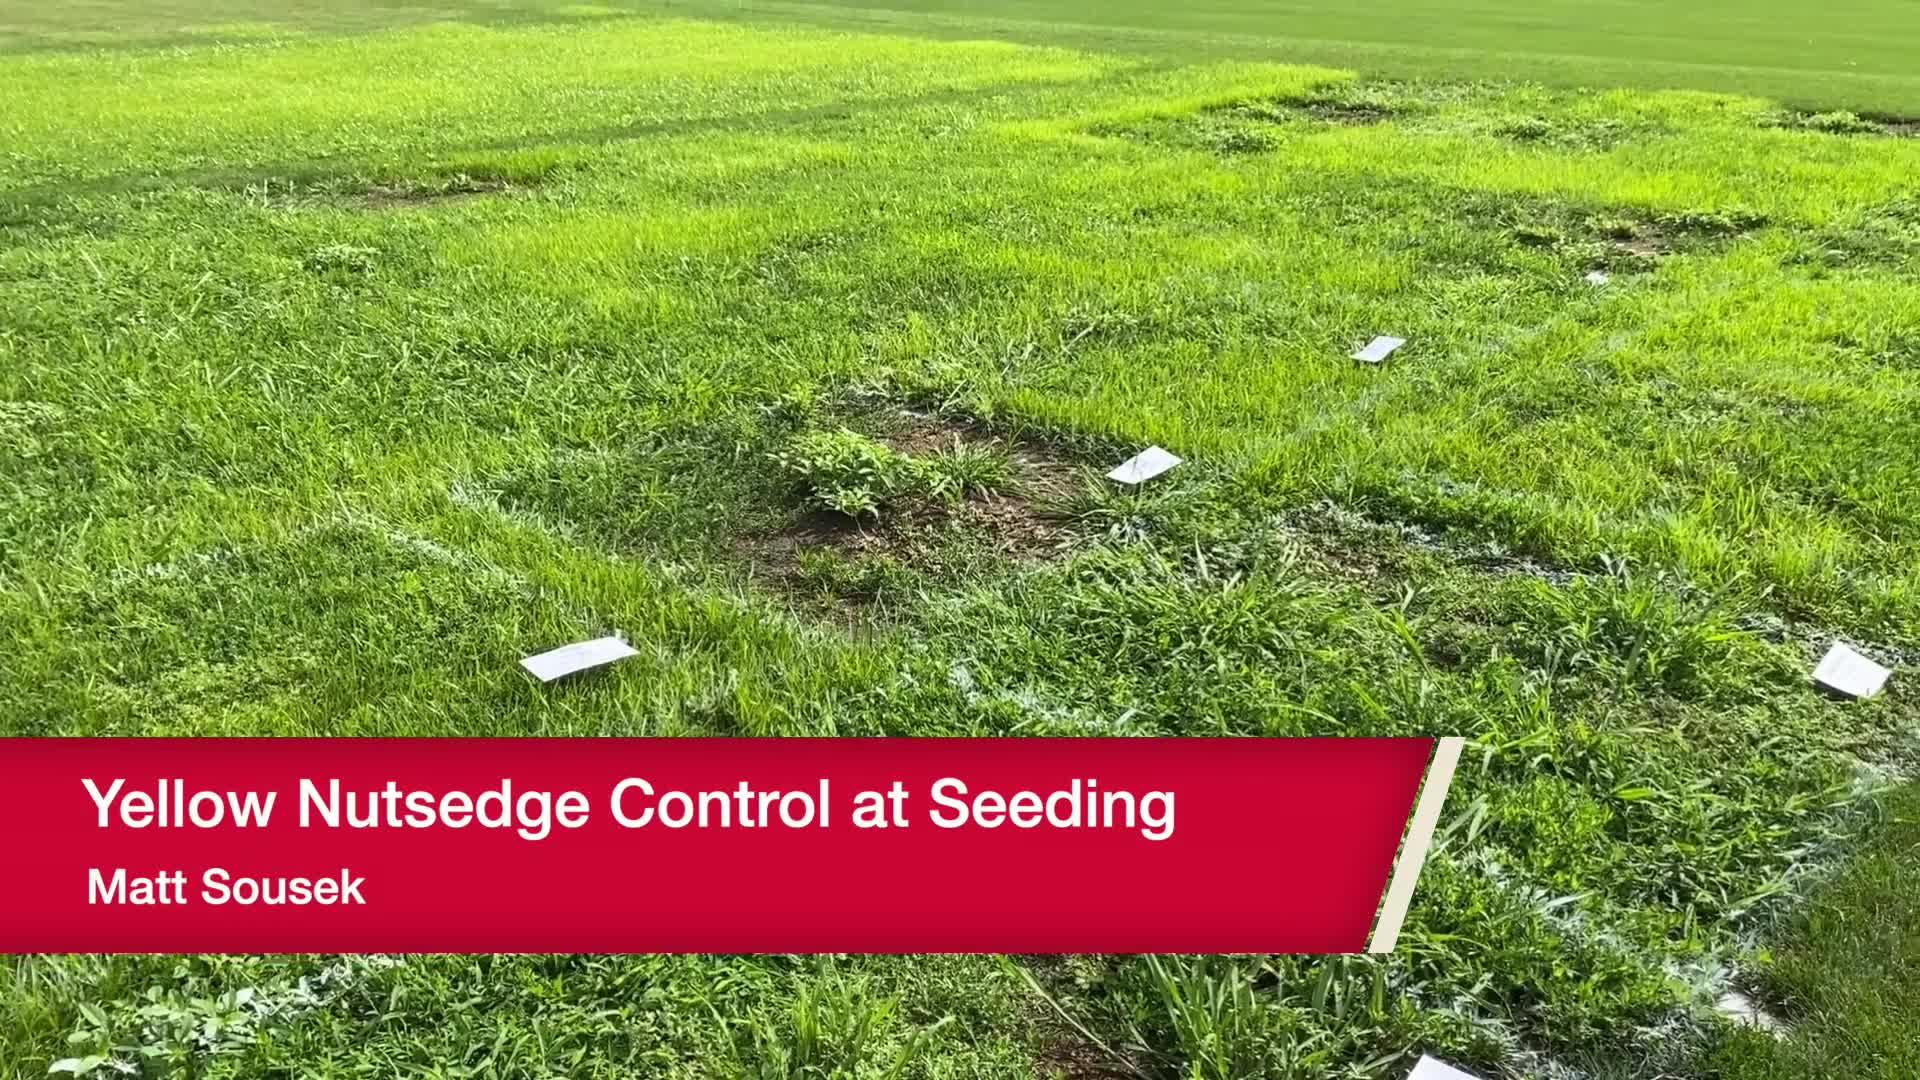 Yellow Nutsedge Control at Seeding